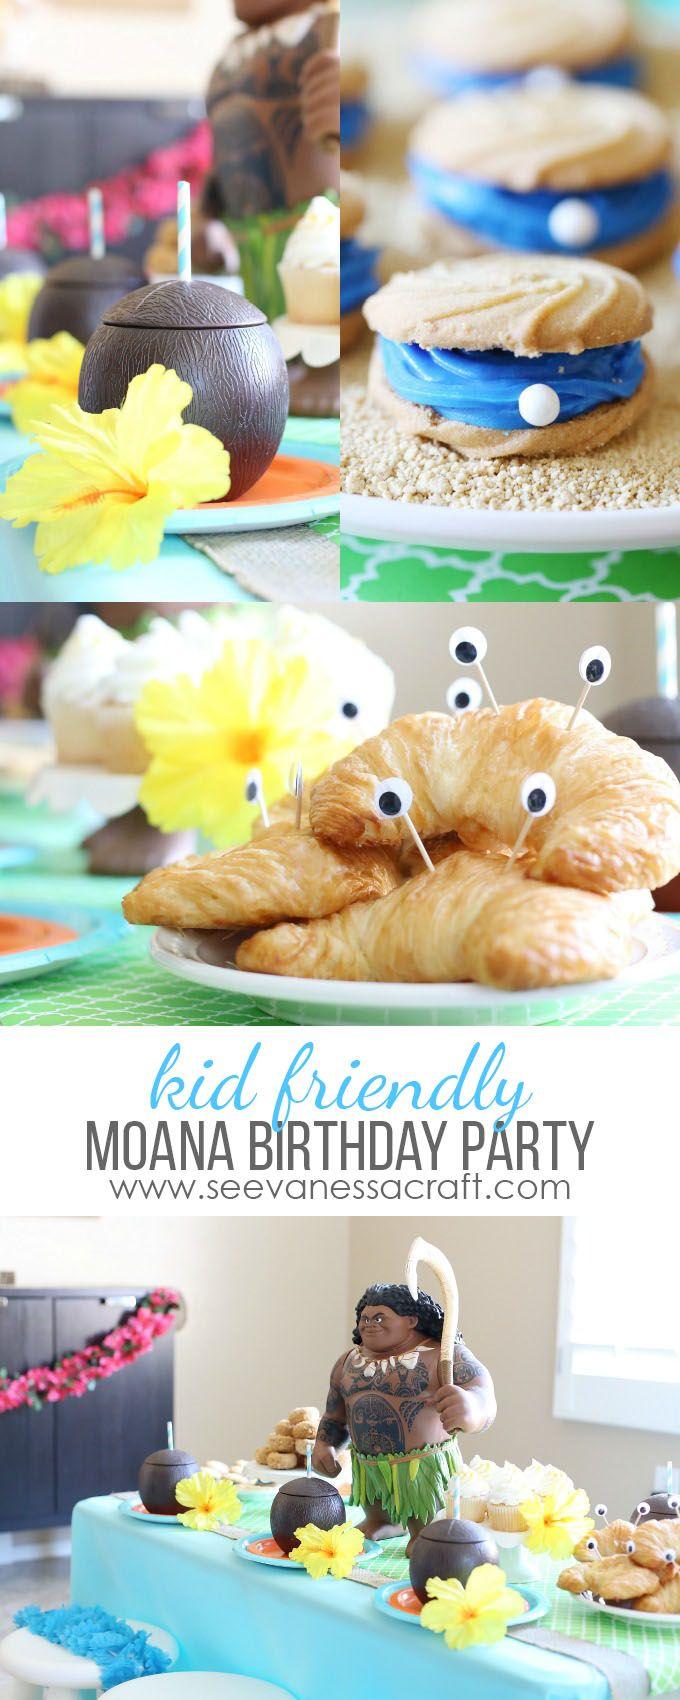 disney moana luau birthday party birthday holiday party ideas pinterest. Black Bedroom Furniture Sets. Home Design Ideas